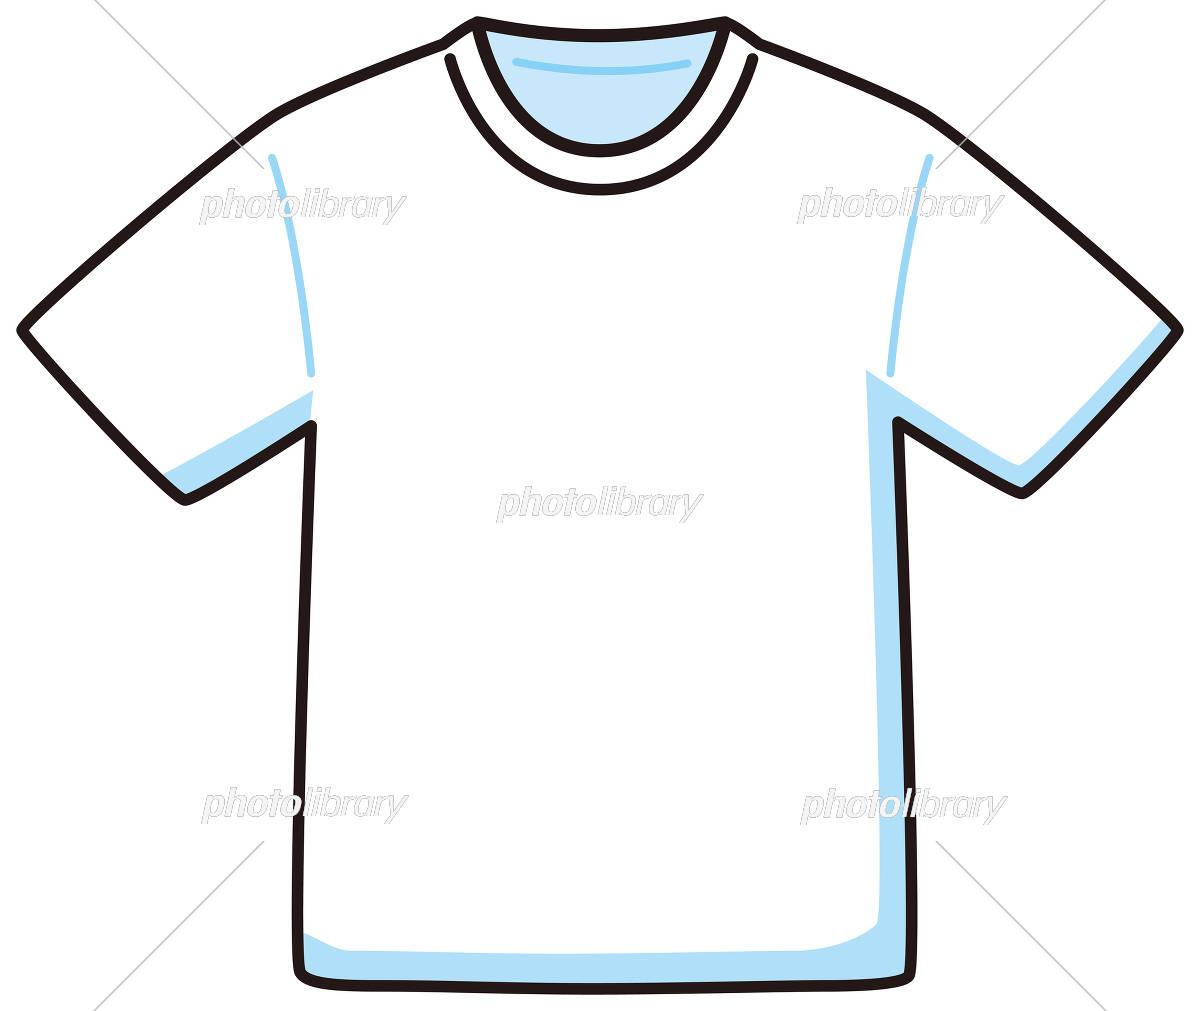 Tシャツ イラスト素材 5597338 フォトライブラリー Photolibrary